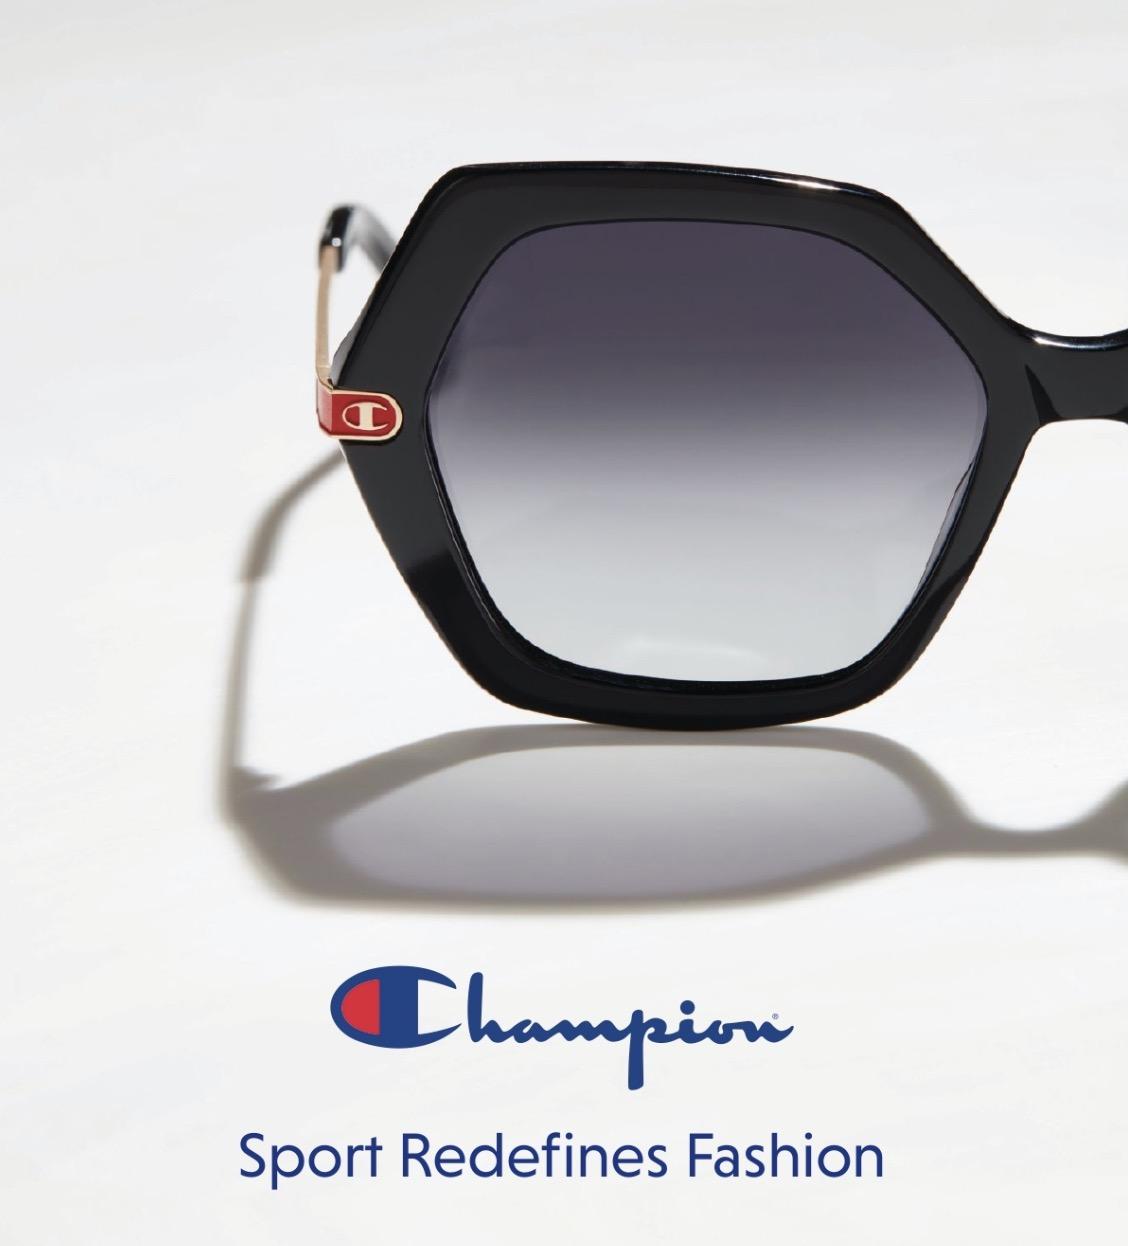 Champion Sunglasses with Gradient Tint